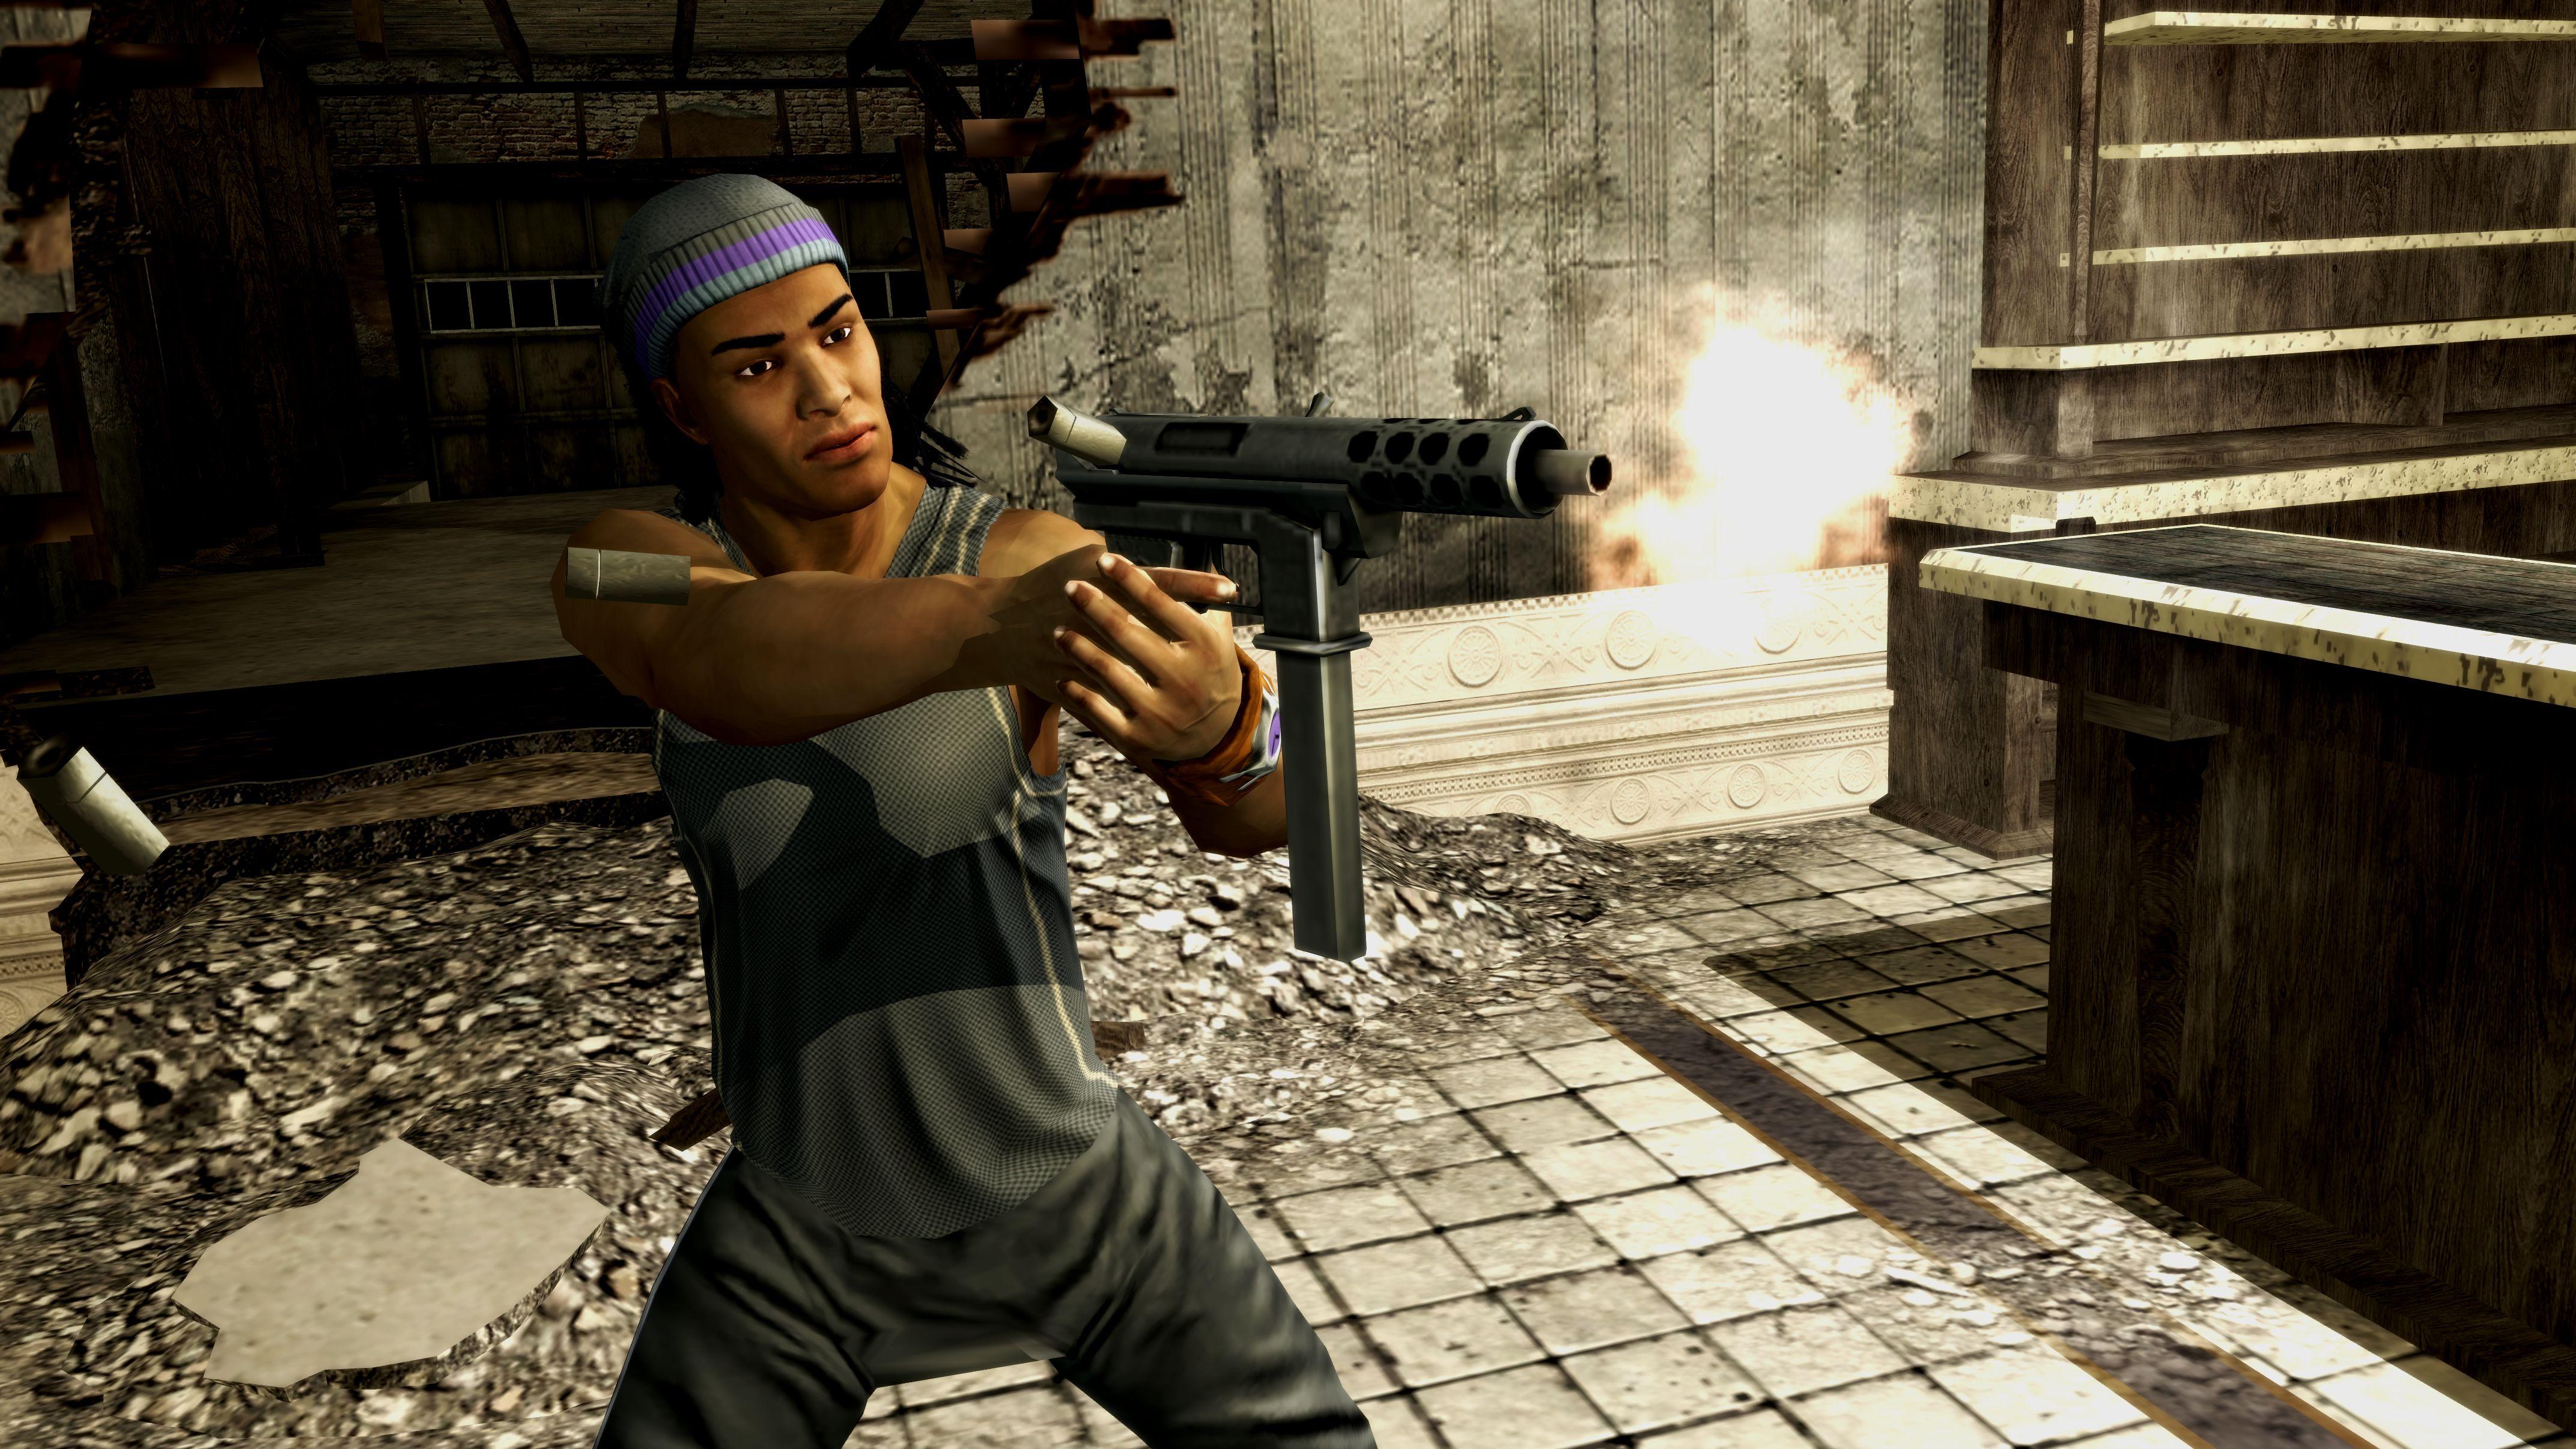 Saints Row 2 on Steam  storesteampoweredcom